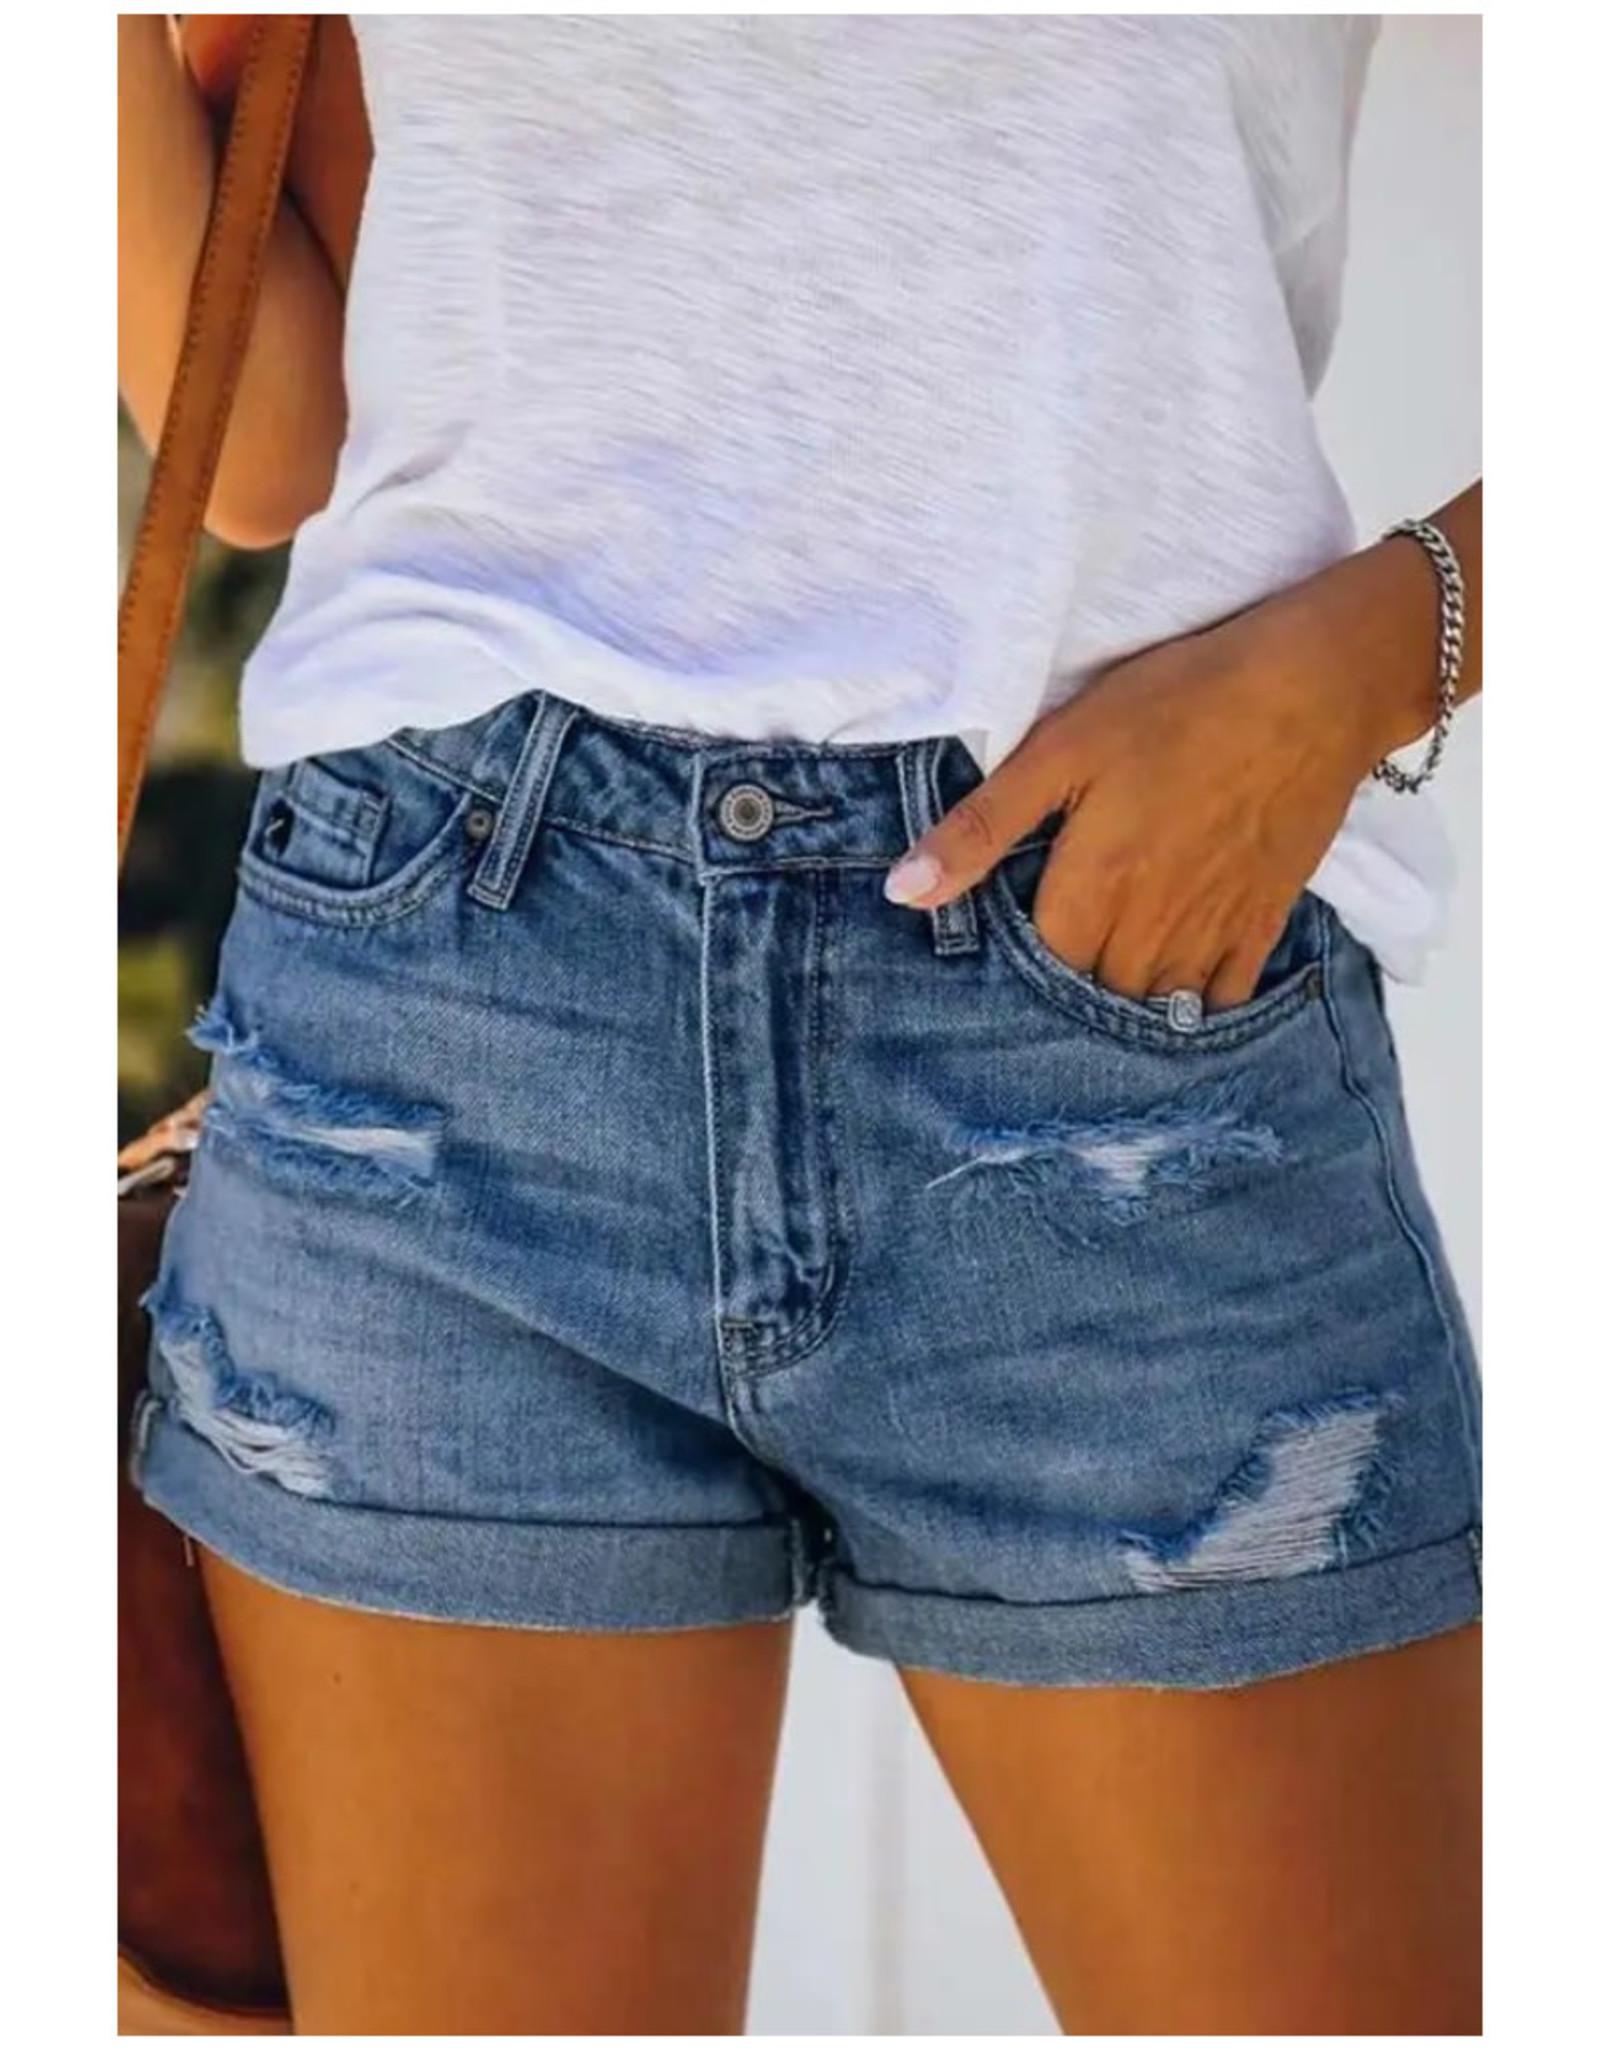 Distressed Denim Shorts with Cuffs